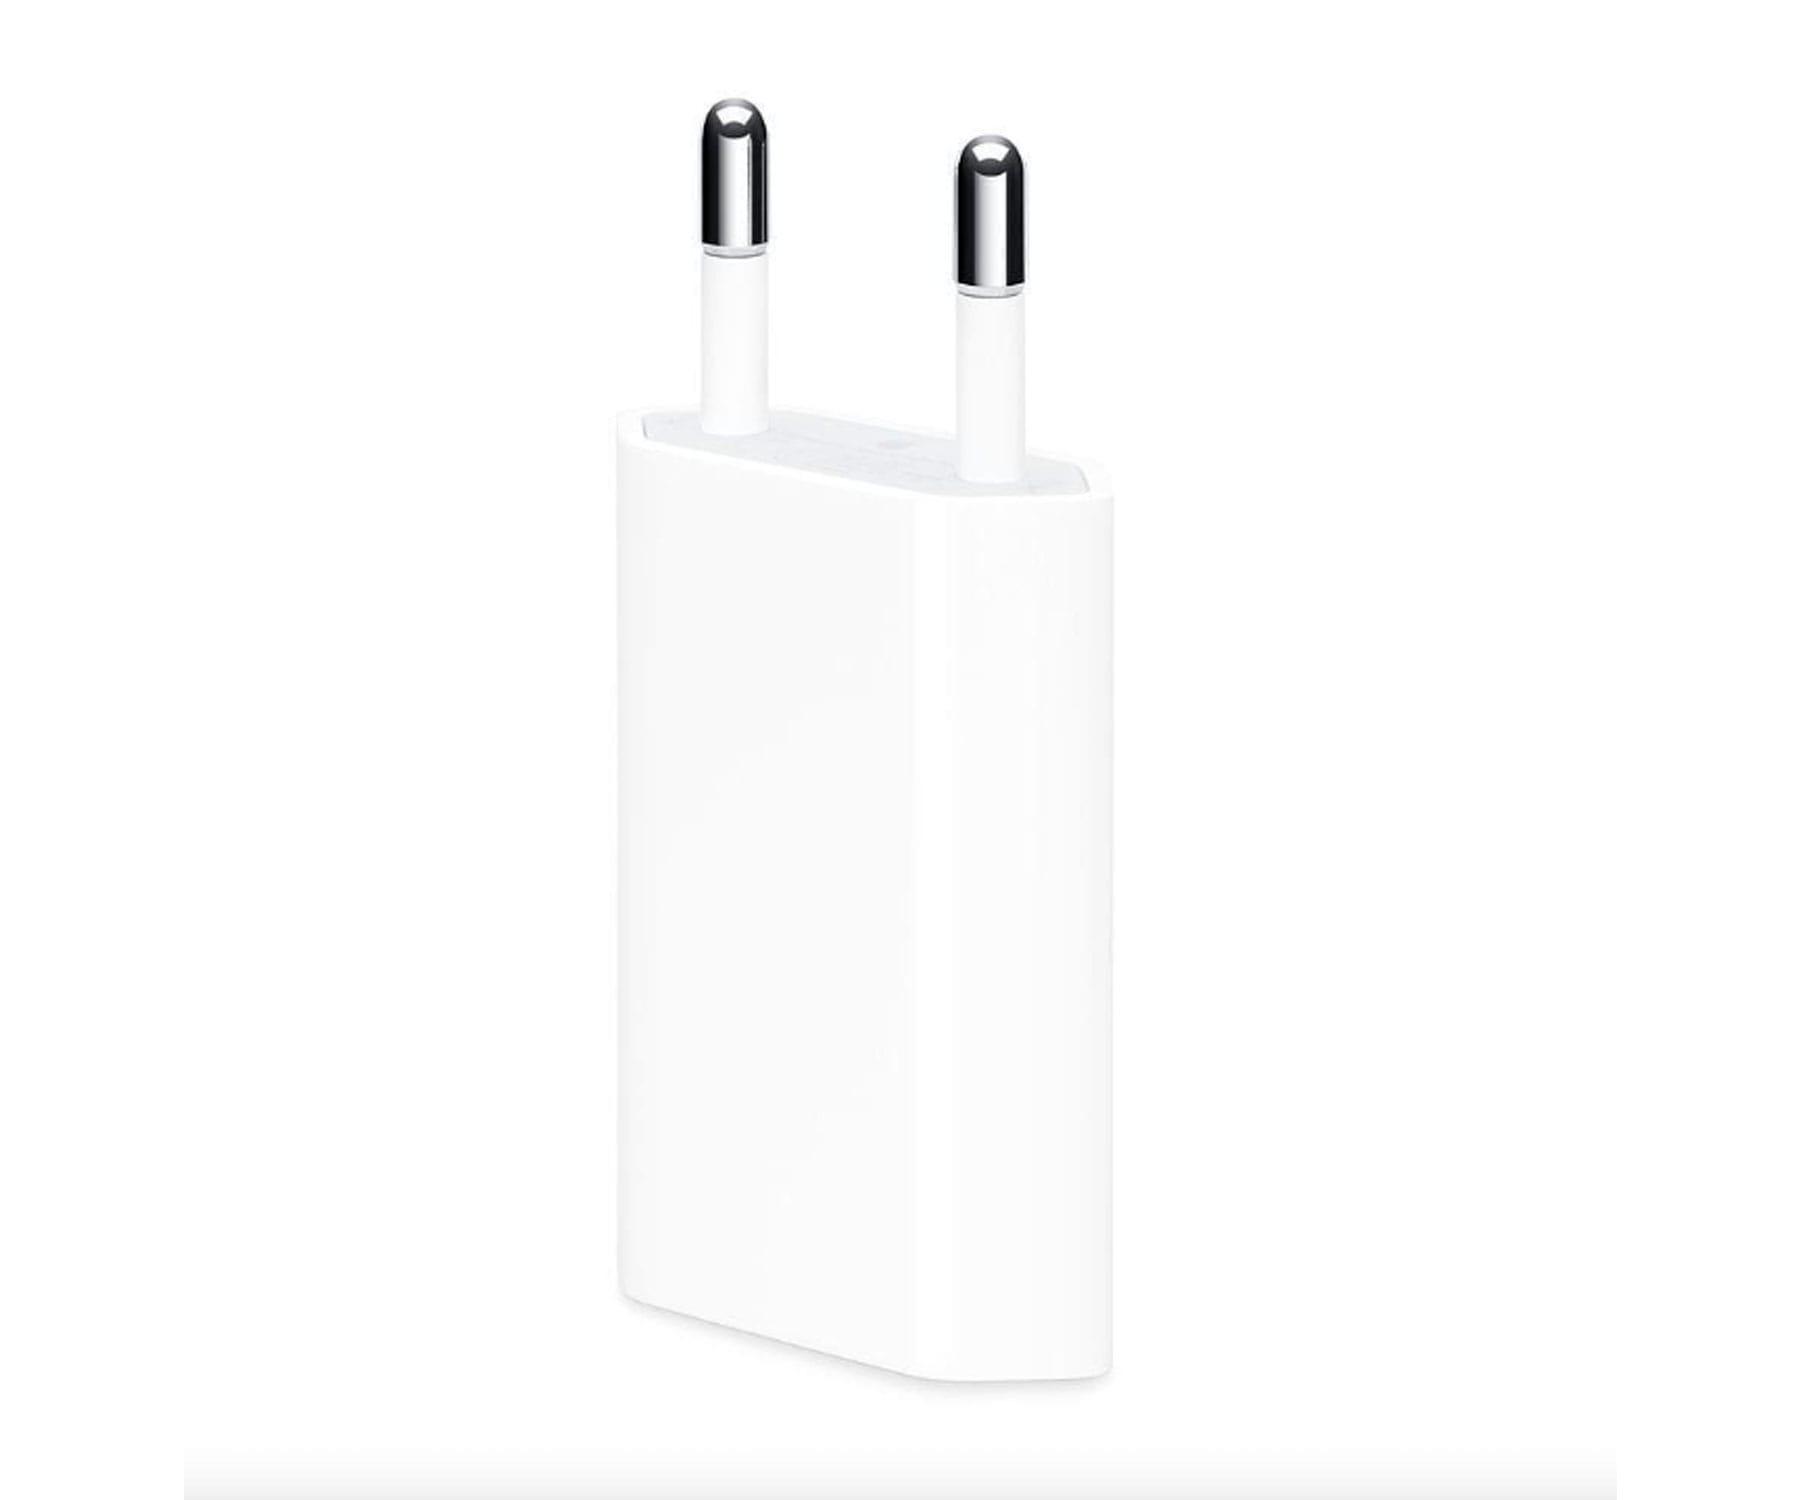 APPLE MGN13ZM/A USB BLANCO CARGADOR DE PARED, ADAPTADOR DE CORRIENTE USB DE 5W ORIGINAL DE APPLE